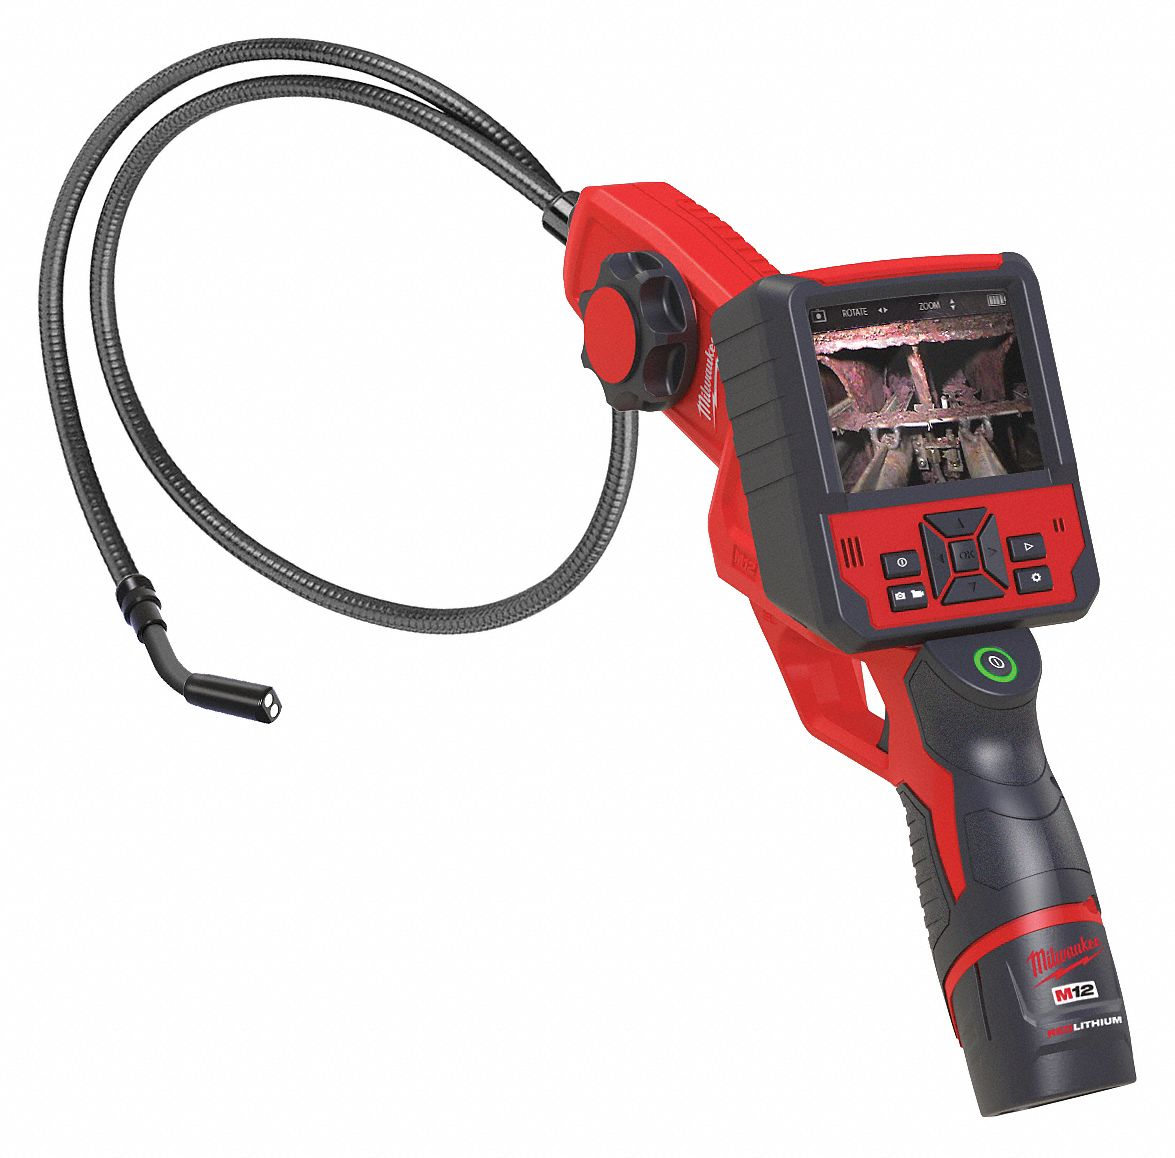 M12 Video Borescope 36 In Shaft MILWAUKEE 2313-21 2.7 In